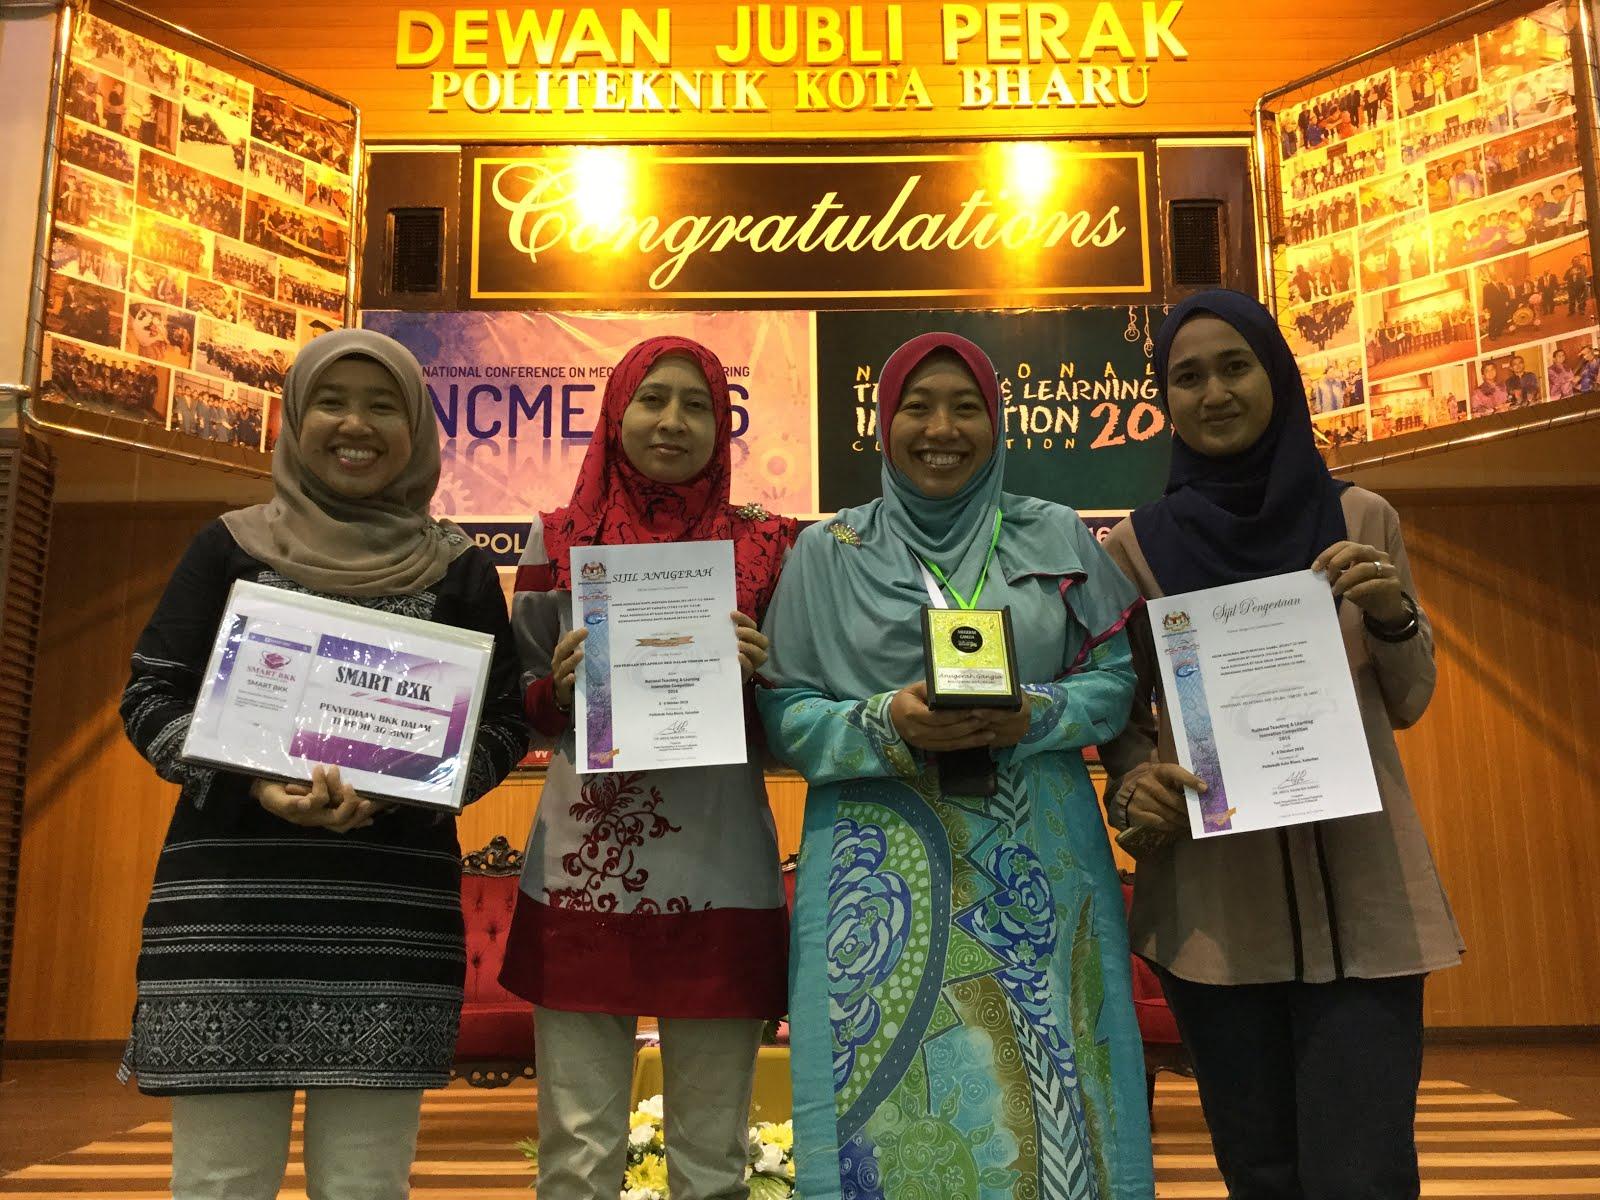 National Teaching & Learning Innovation 2016